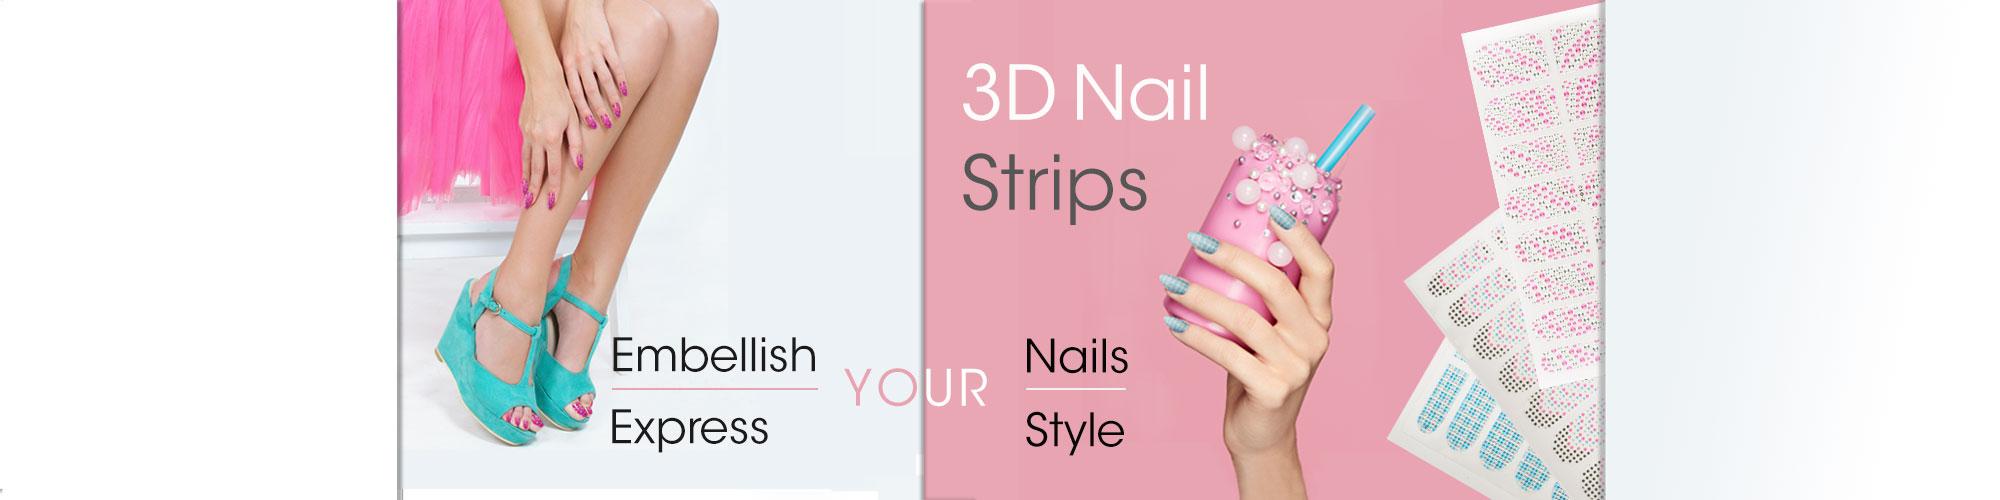 3D-nails-banner-MOBILE1-FLAT--responsive.jpg